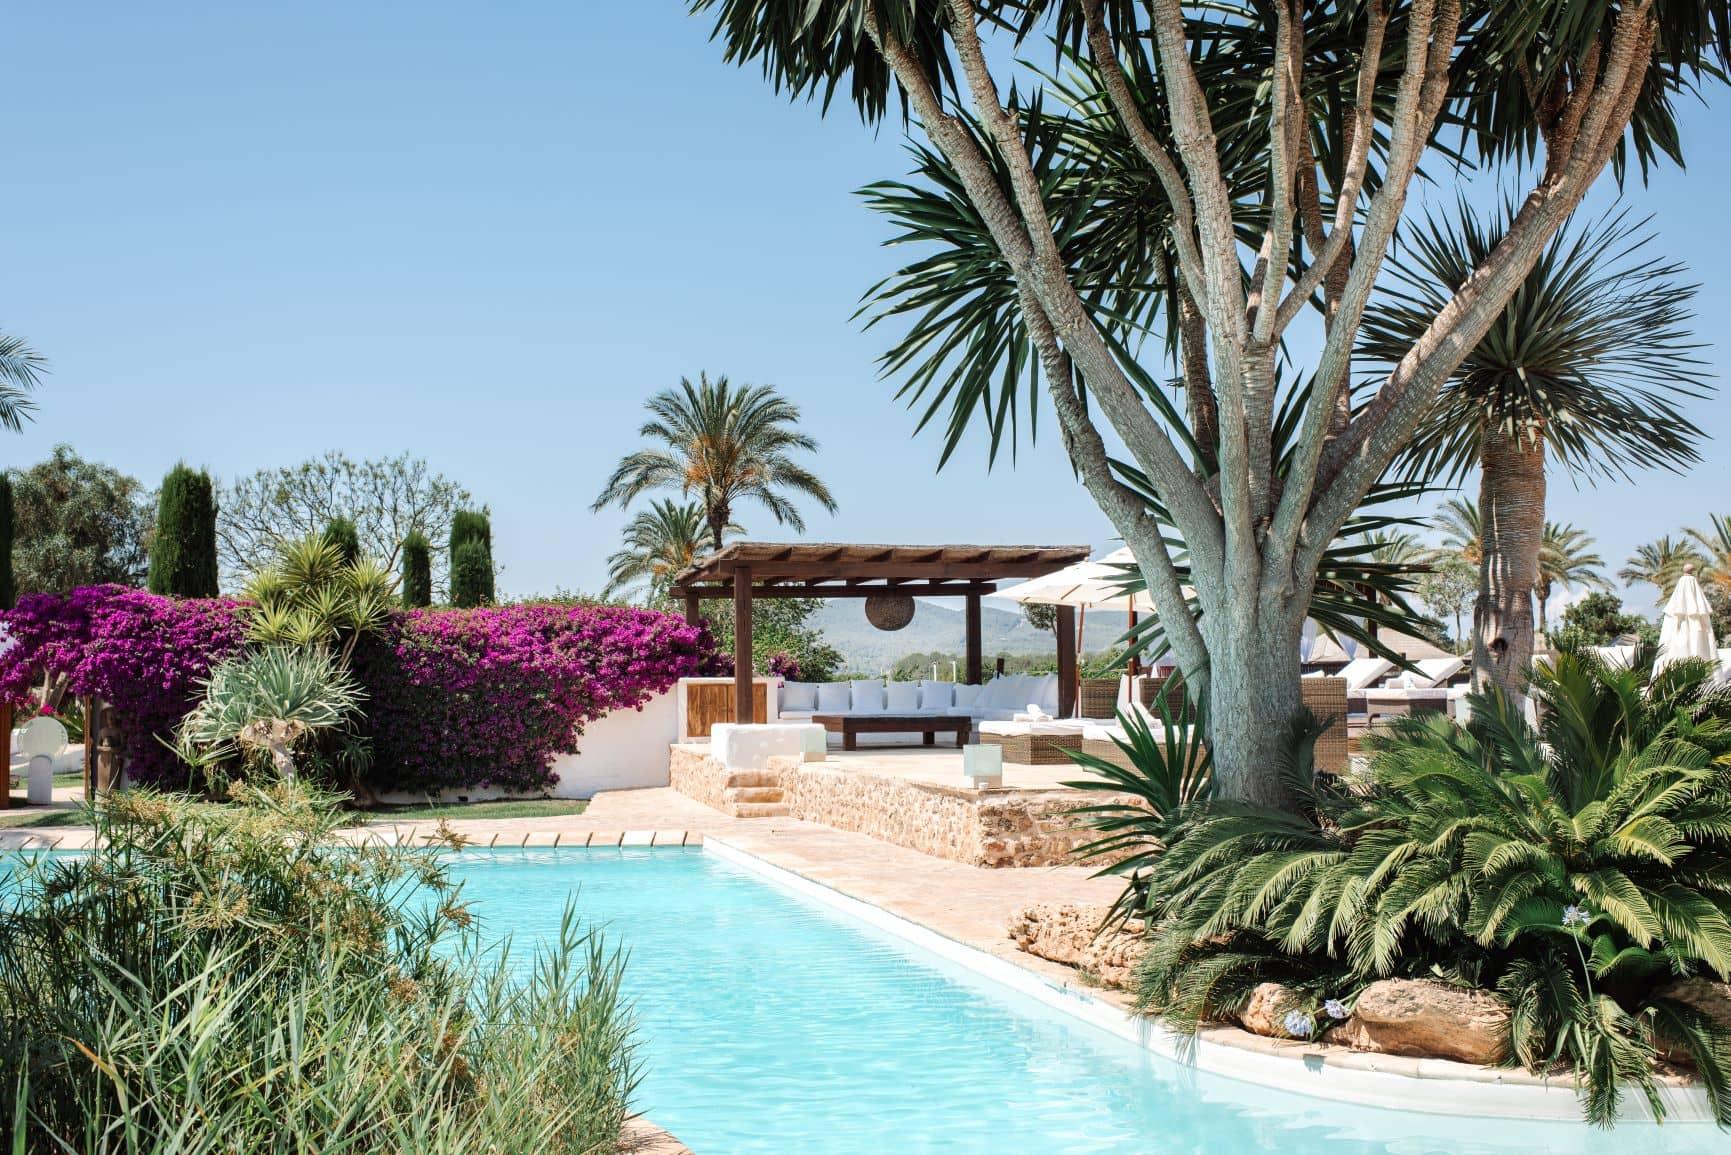 Pool-Landschaft im Atzaro Hotel Ibiza